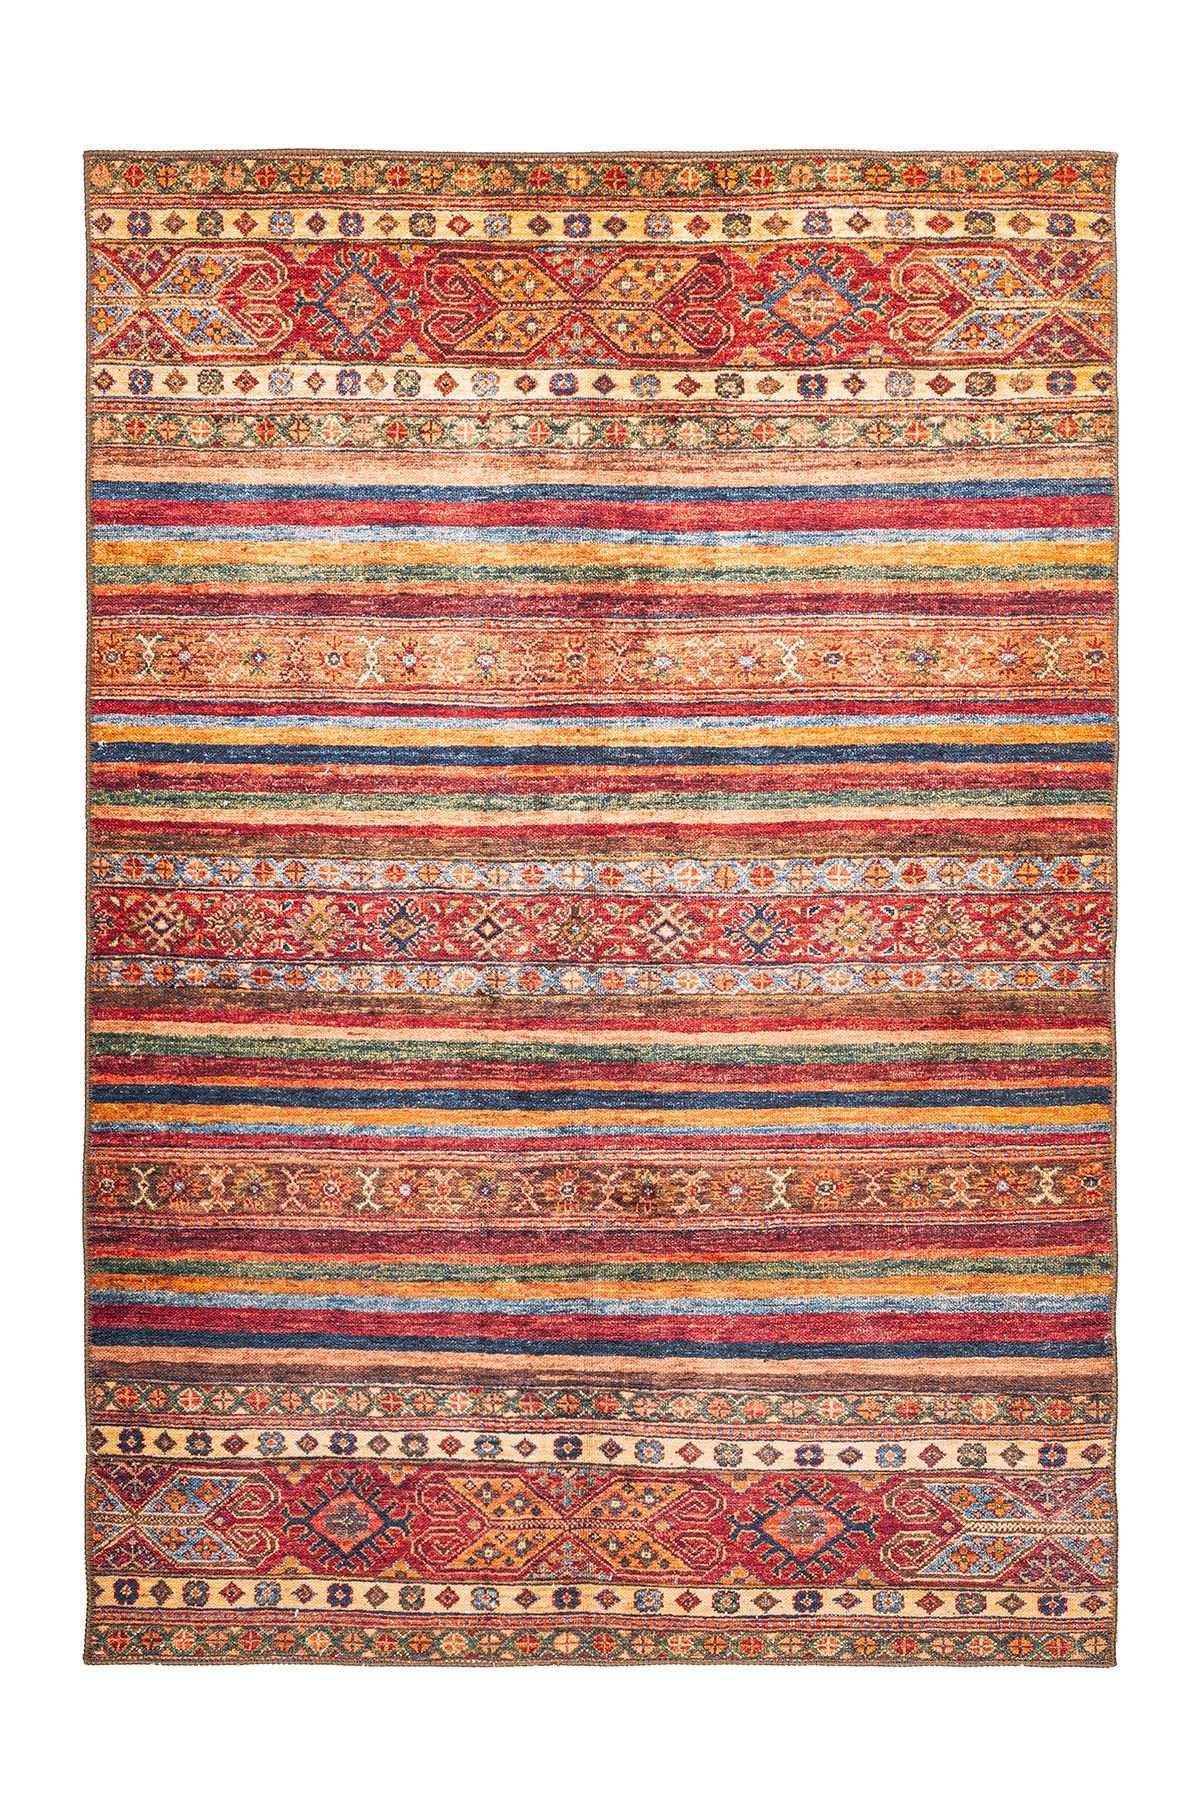 Teppich Ethno Muster